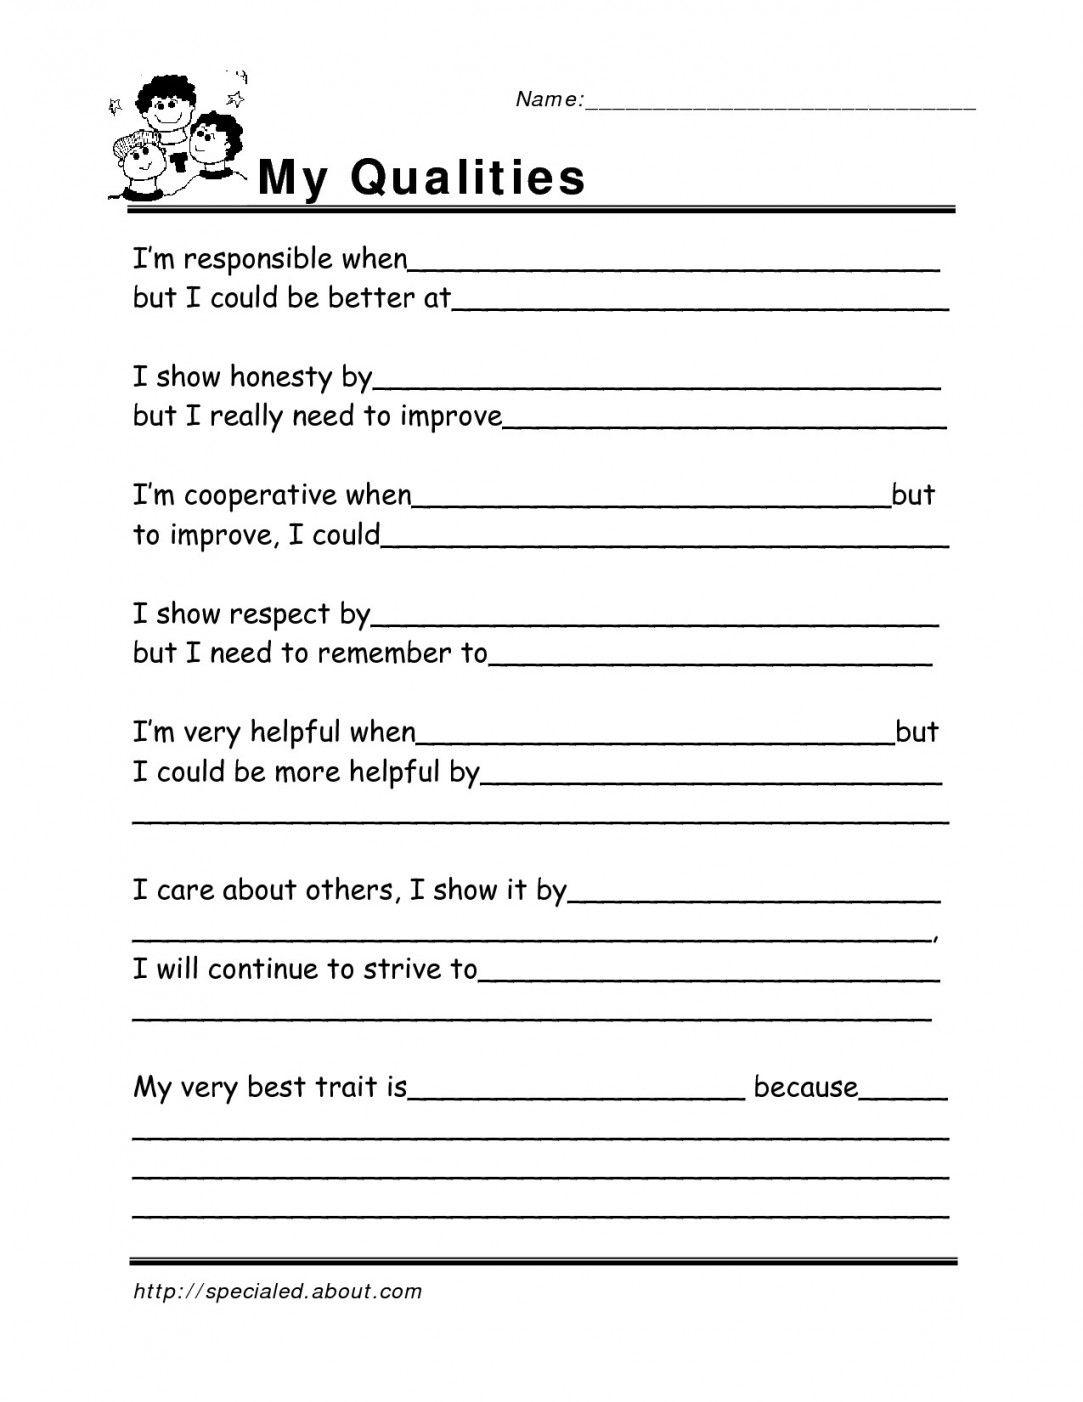 Free Printable Life Skills Worksheets